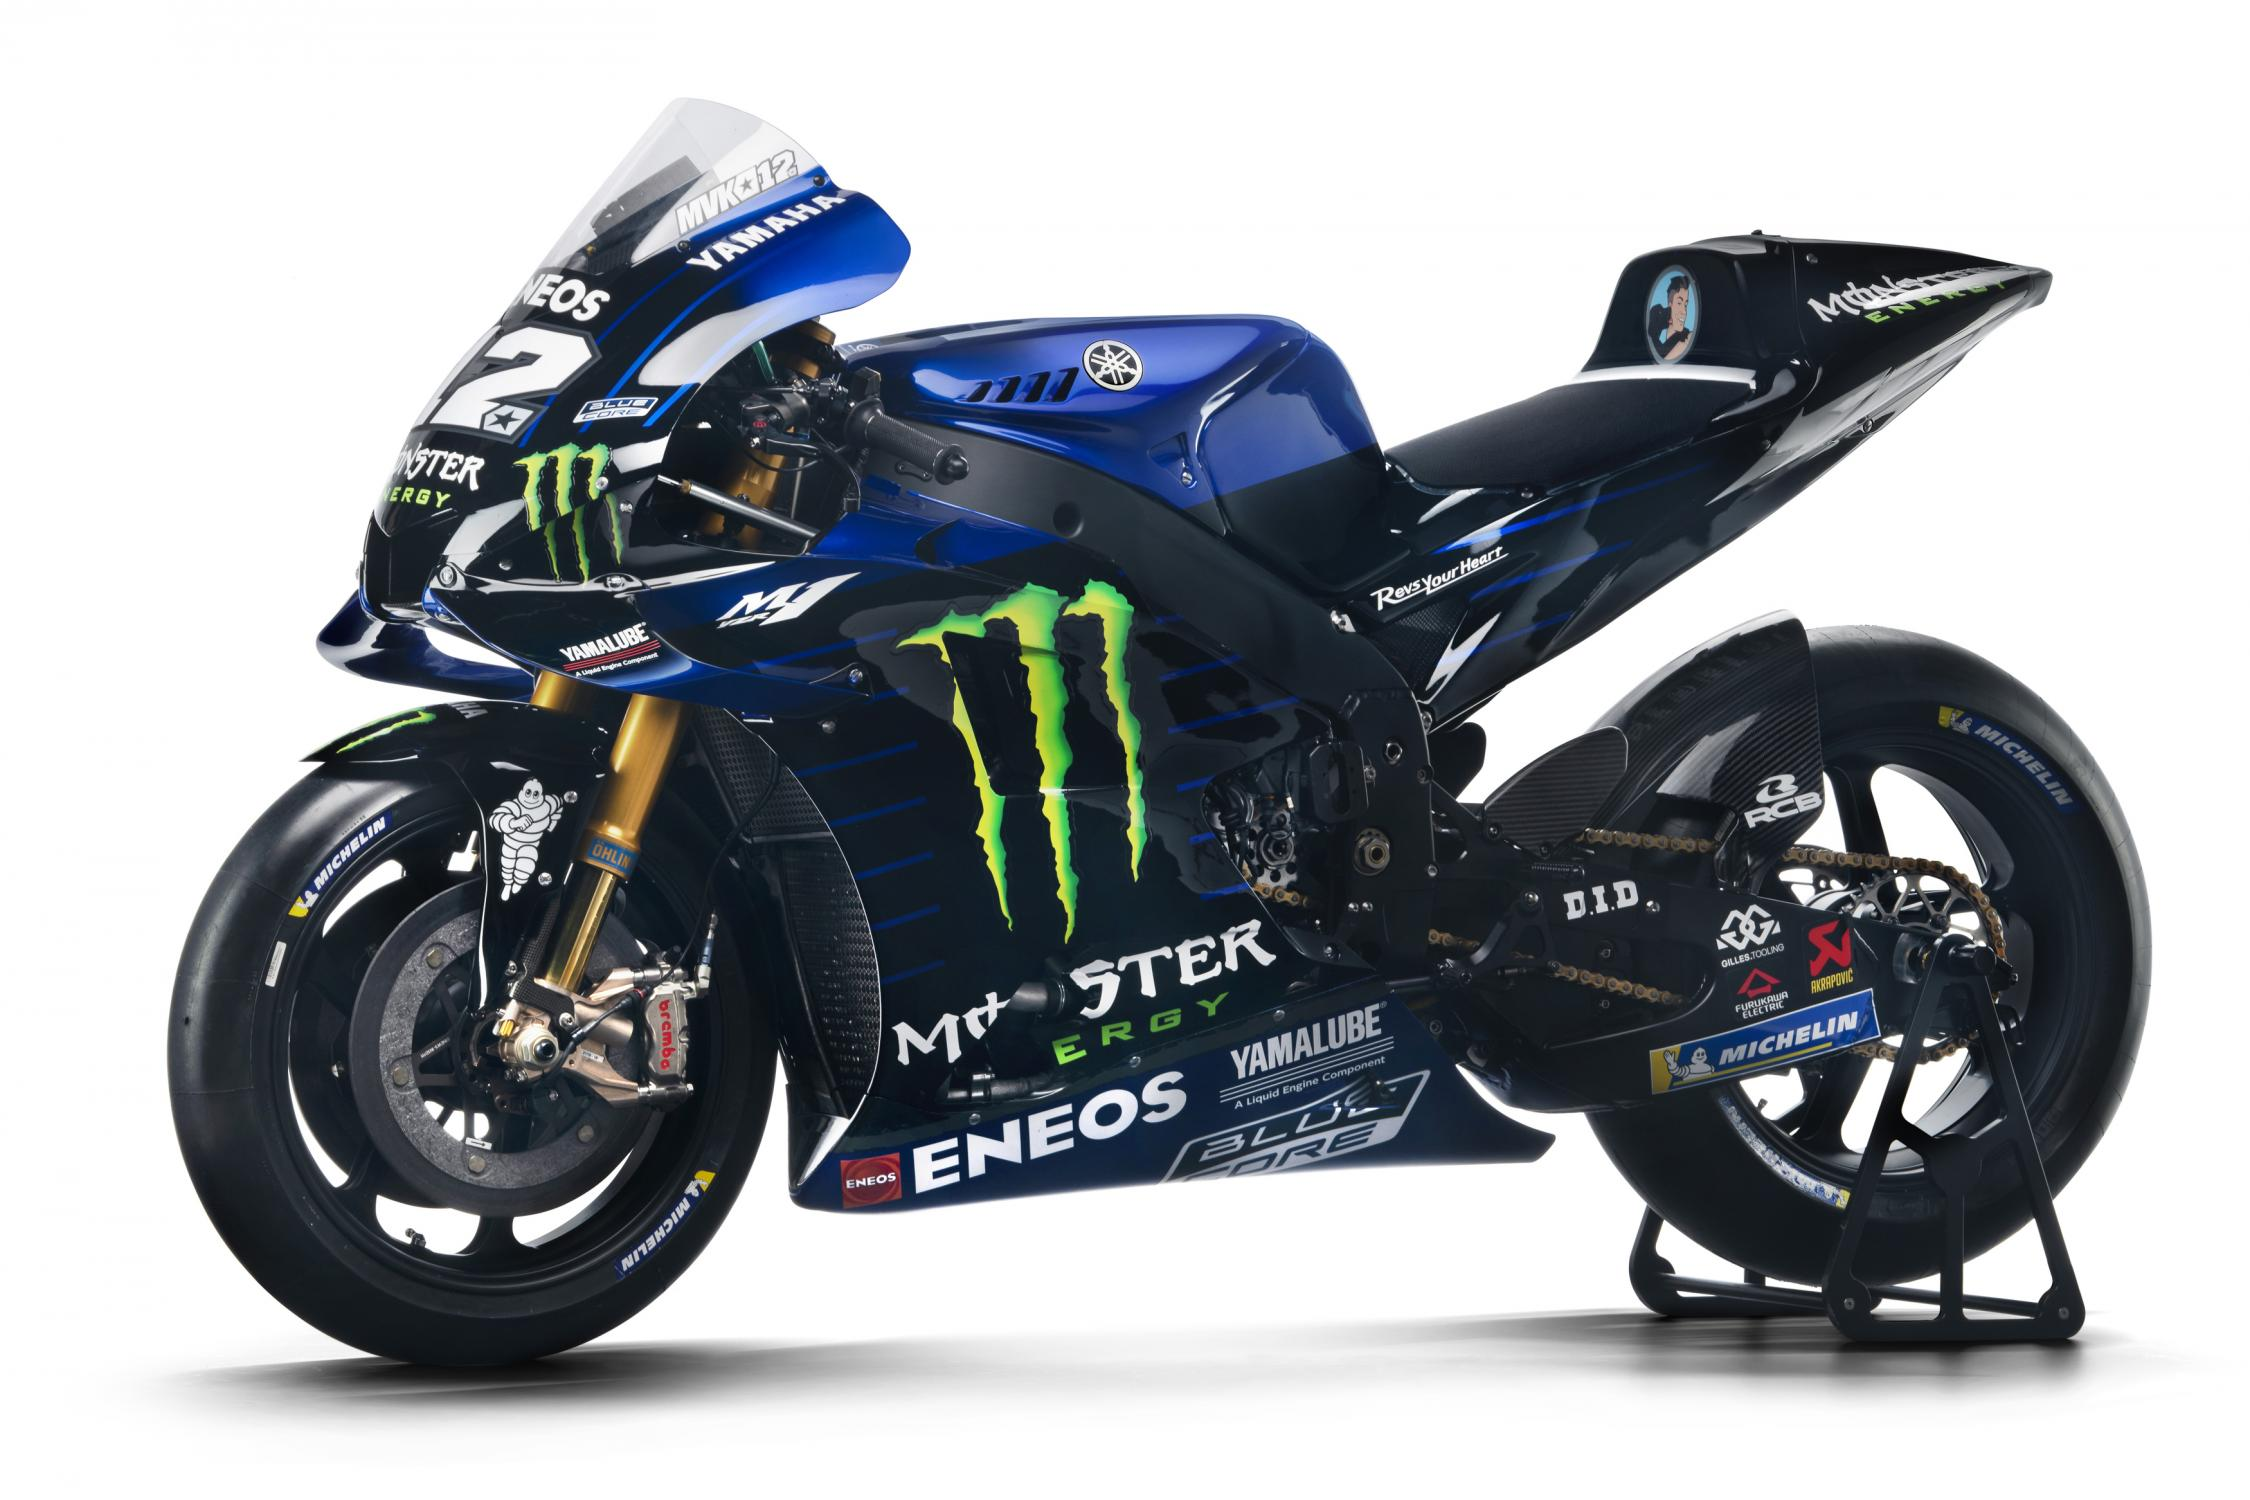 MotoGP 2019: Monster Energy Yamaha MotoGP 2019 Yamaha YZR-M1 Livery